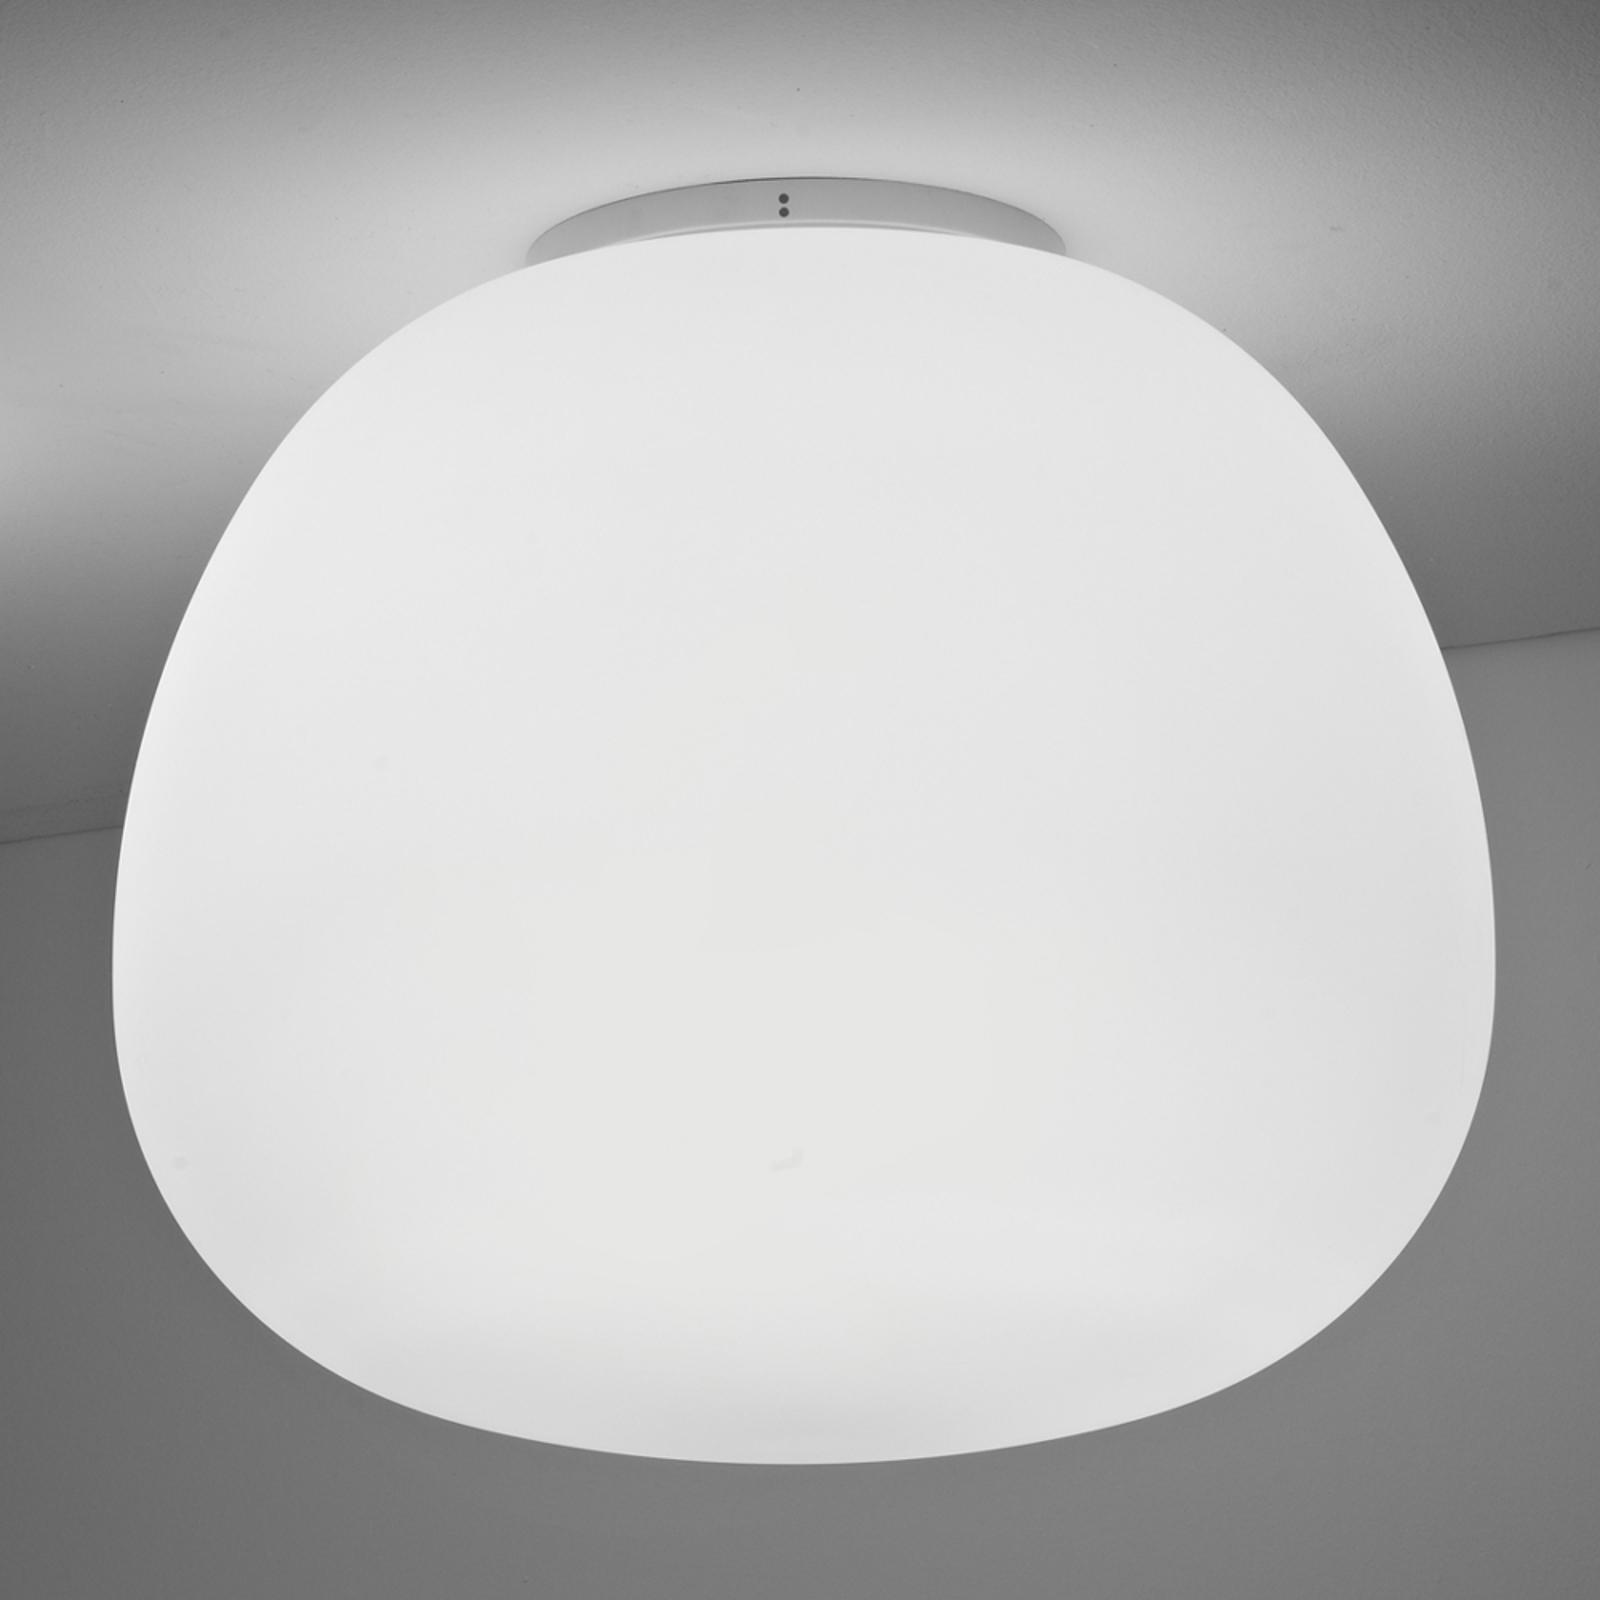 Fabbian Mochi - Deckenleuchte 45 cm